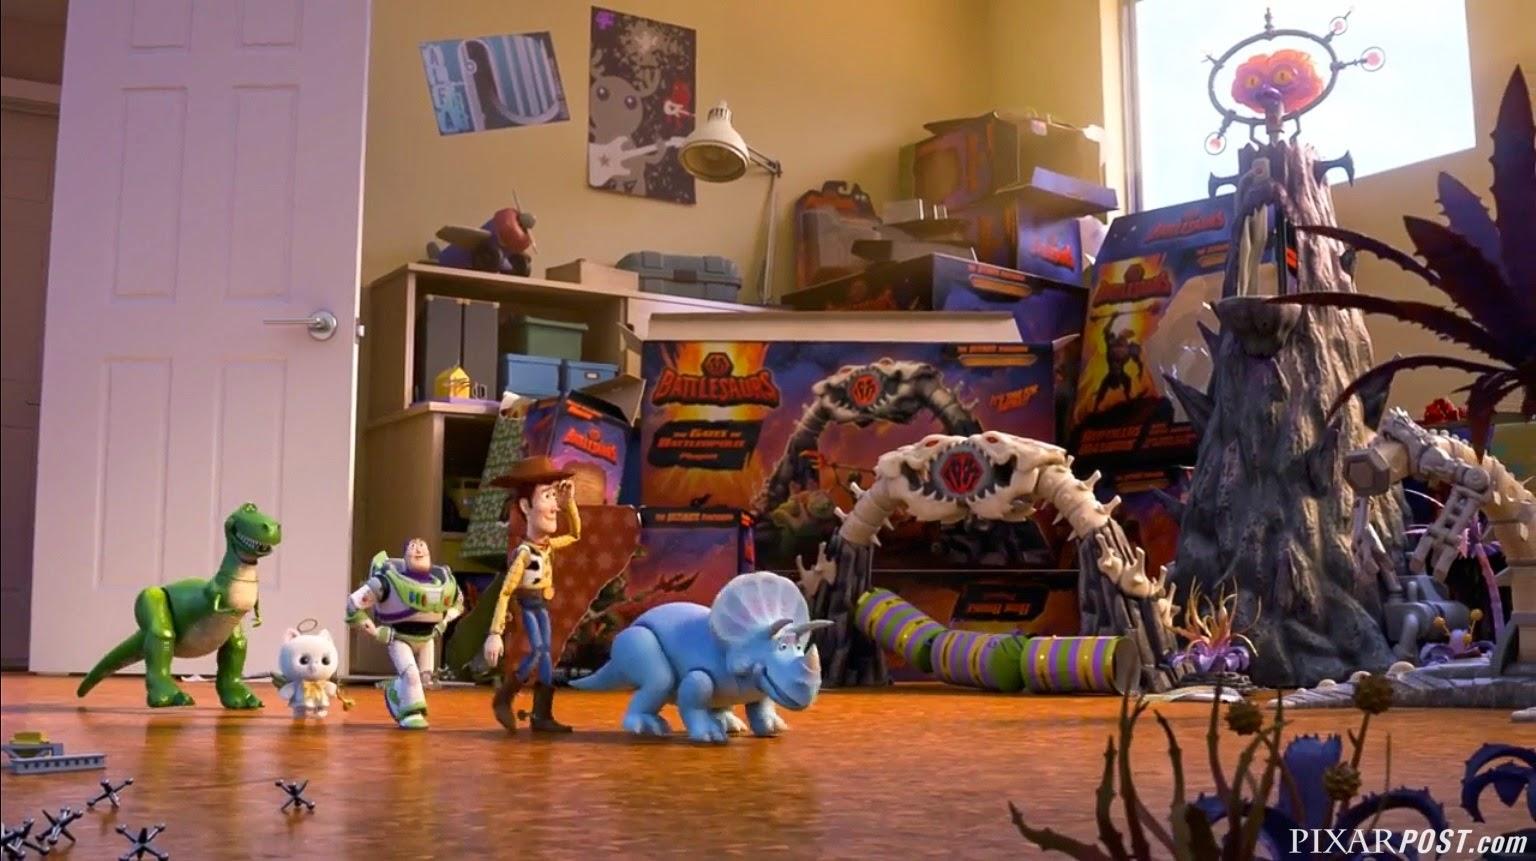 Toy Story That Time Forgot Battlesaur Sky Broadband